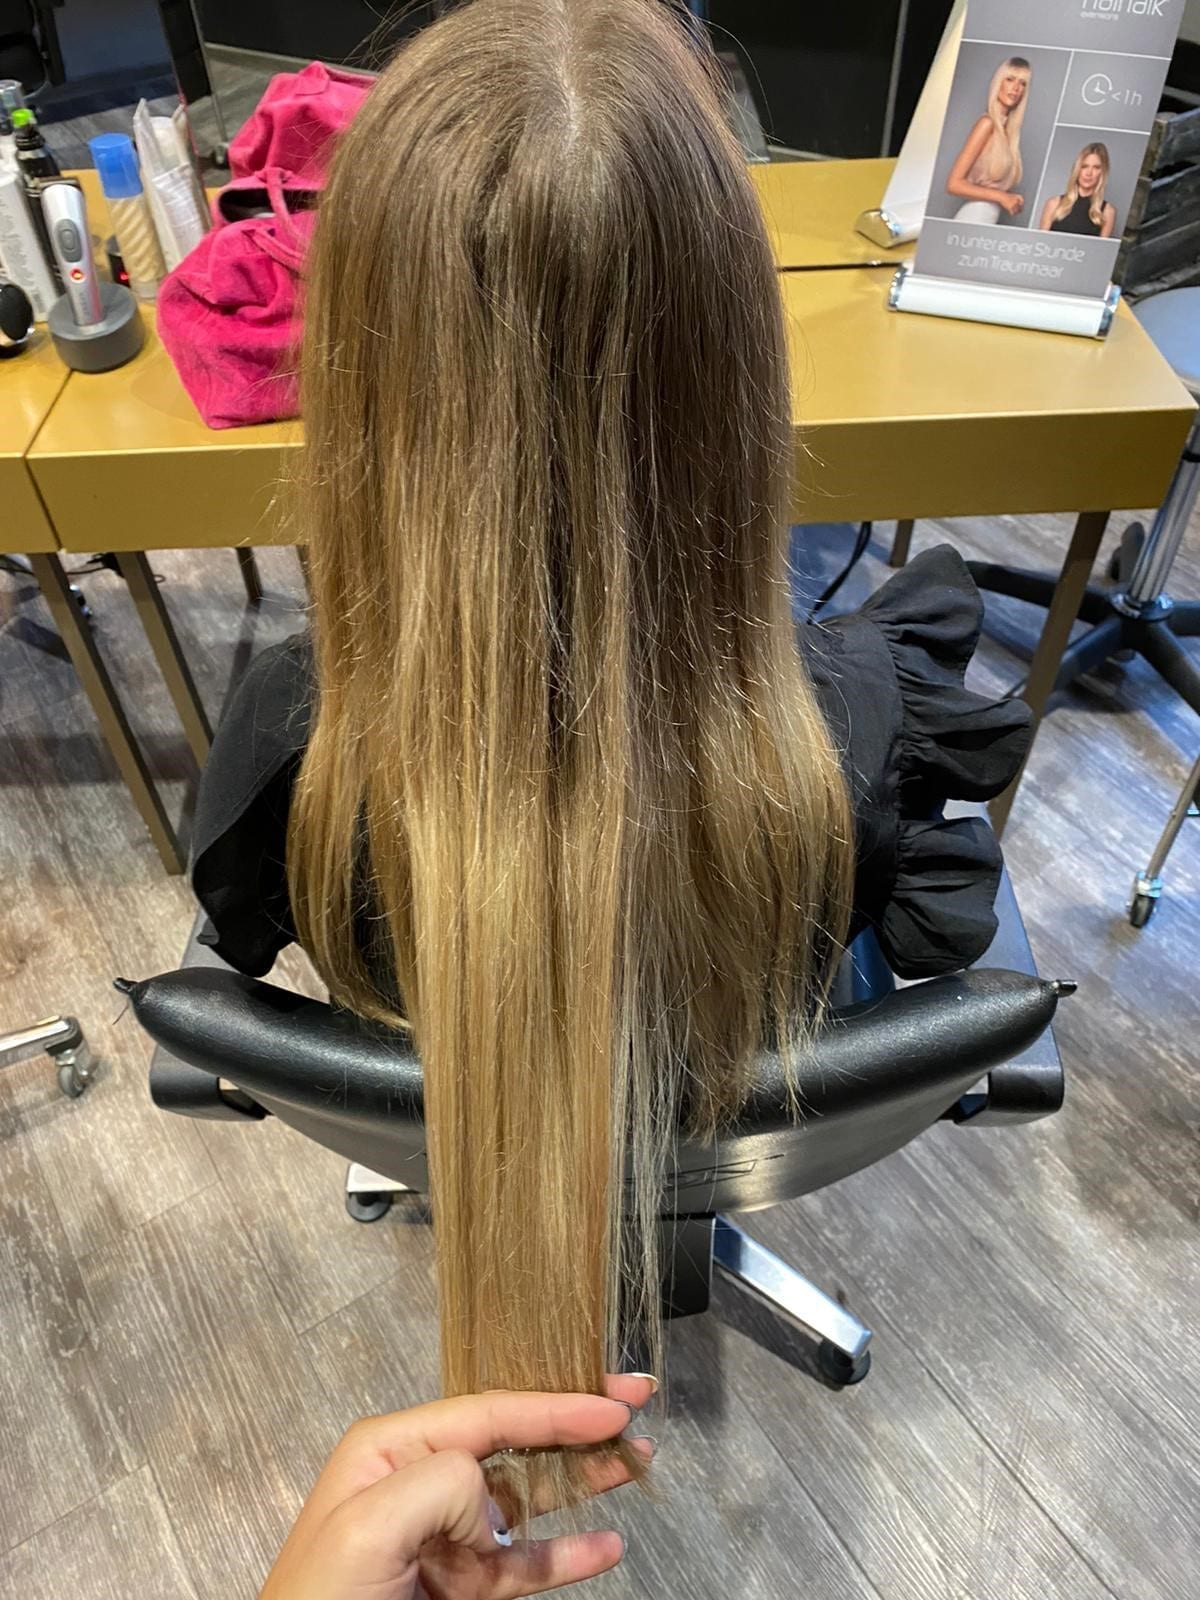 Ihr Top-Friseur in Hannover